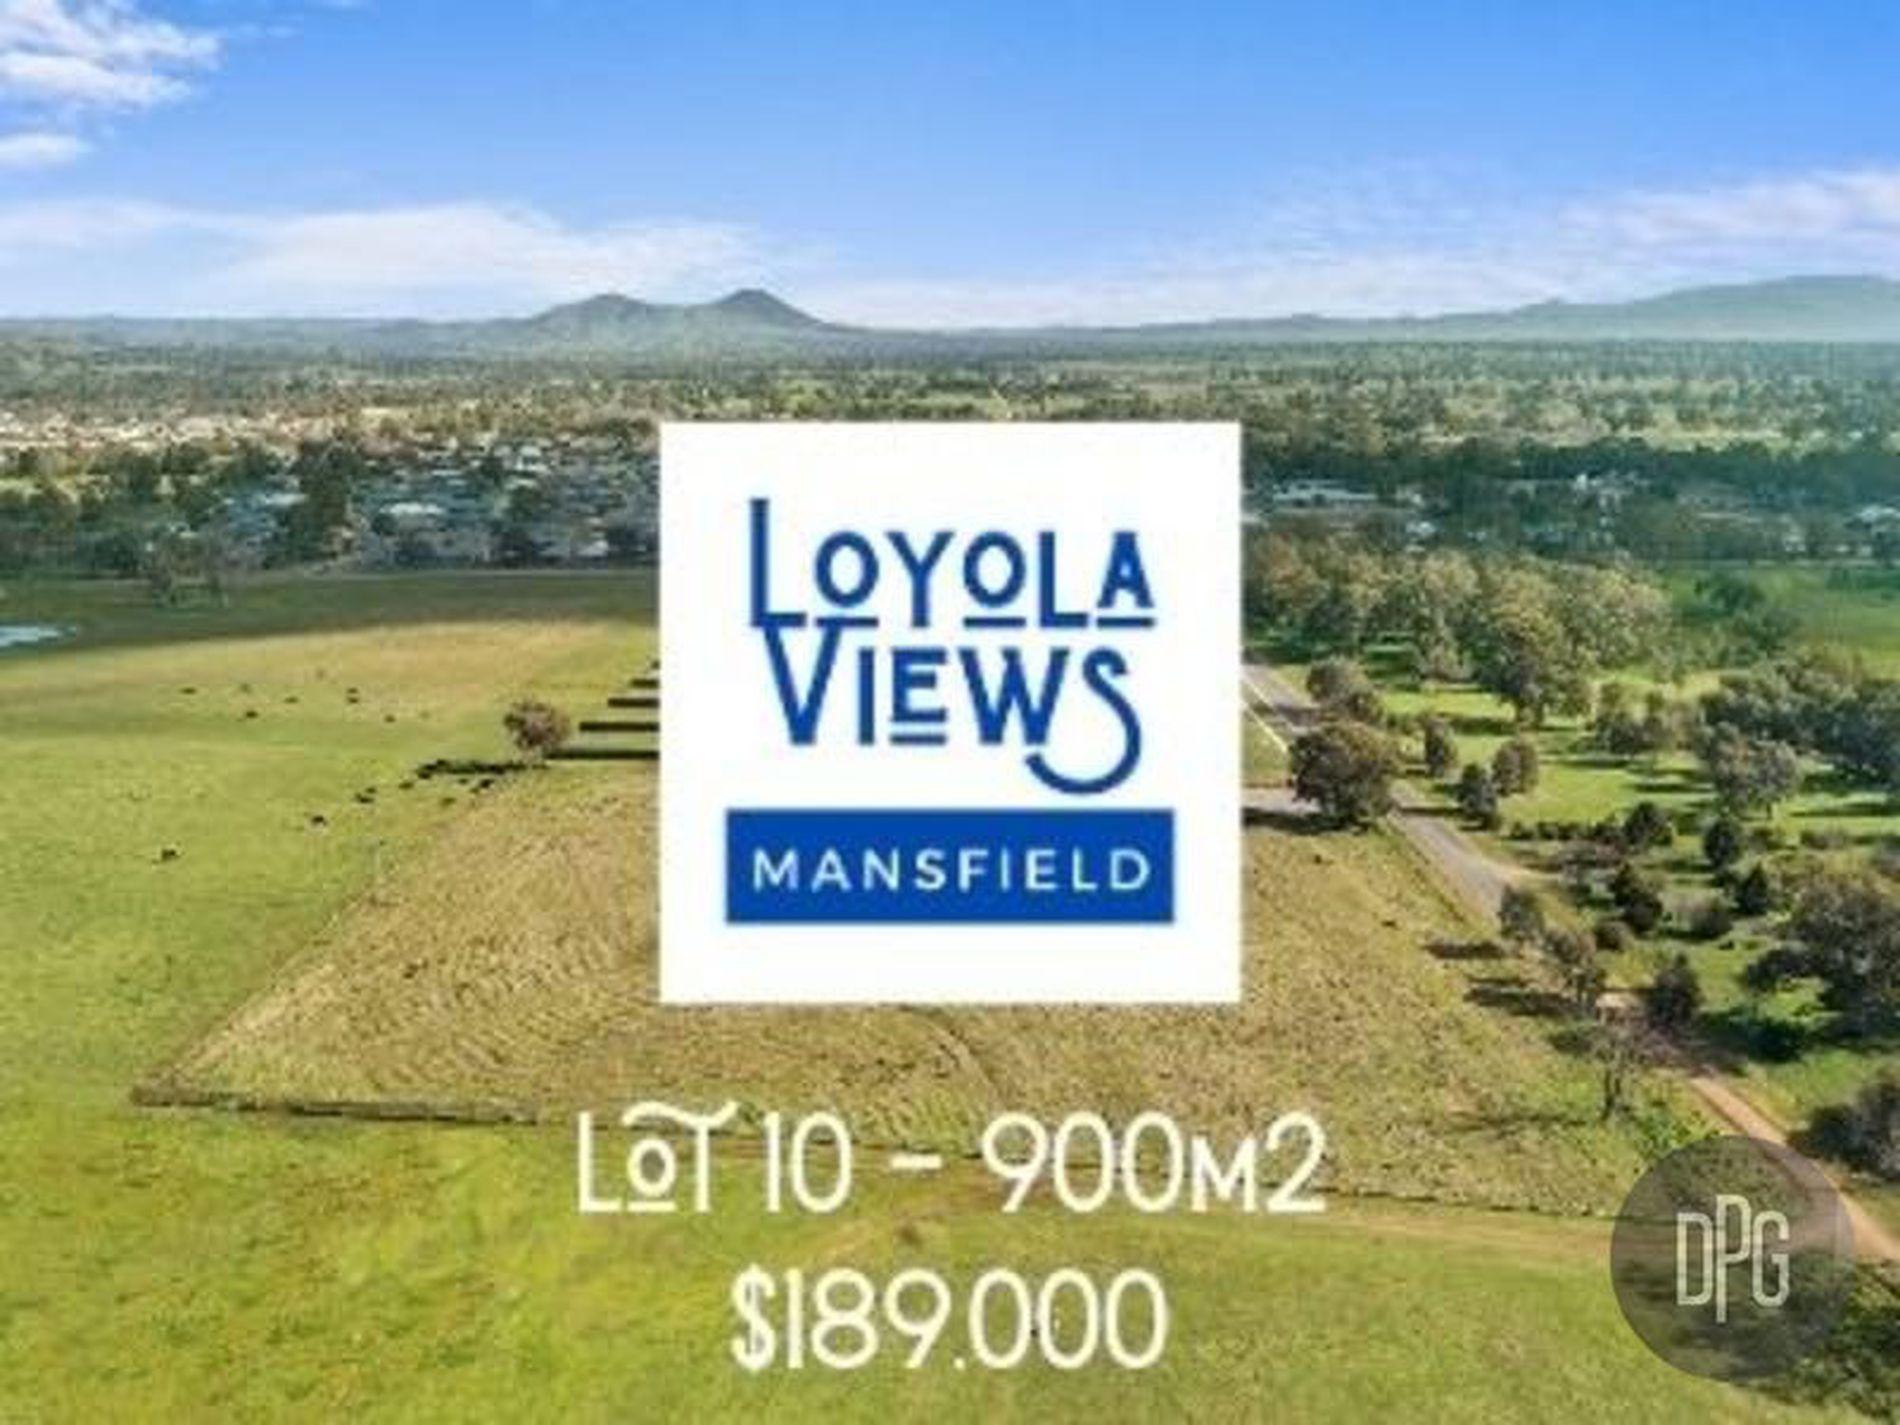 Lot 10, Loyola Views, Mansfield